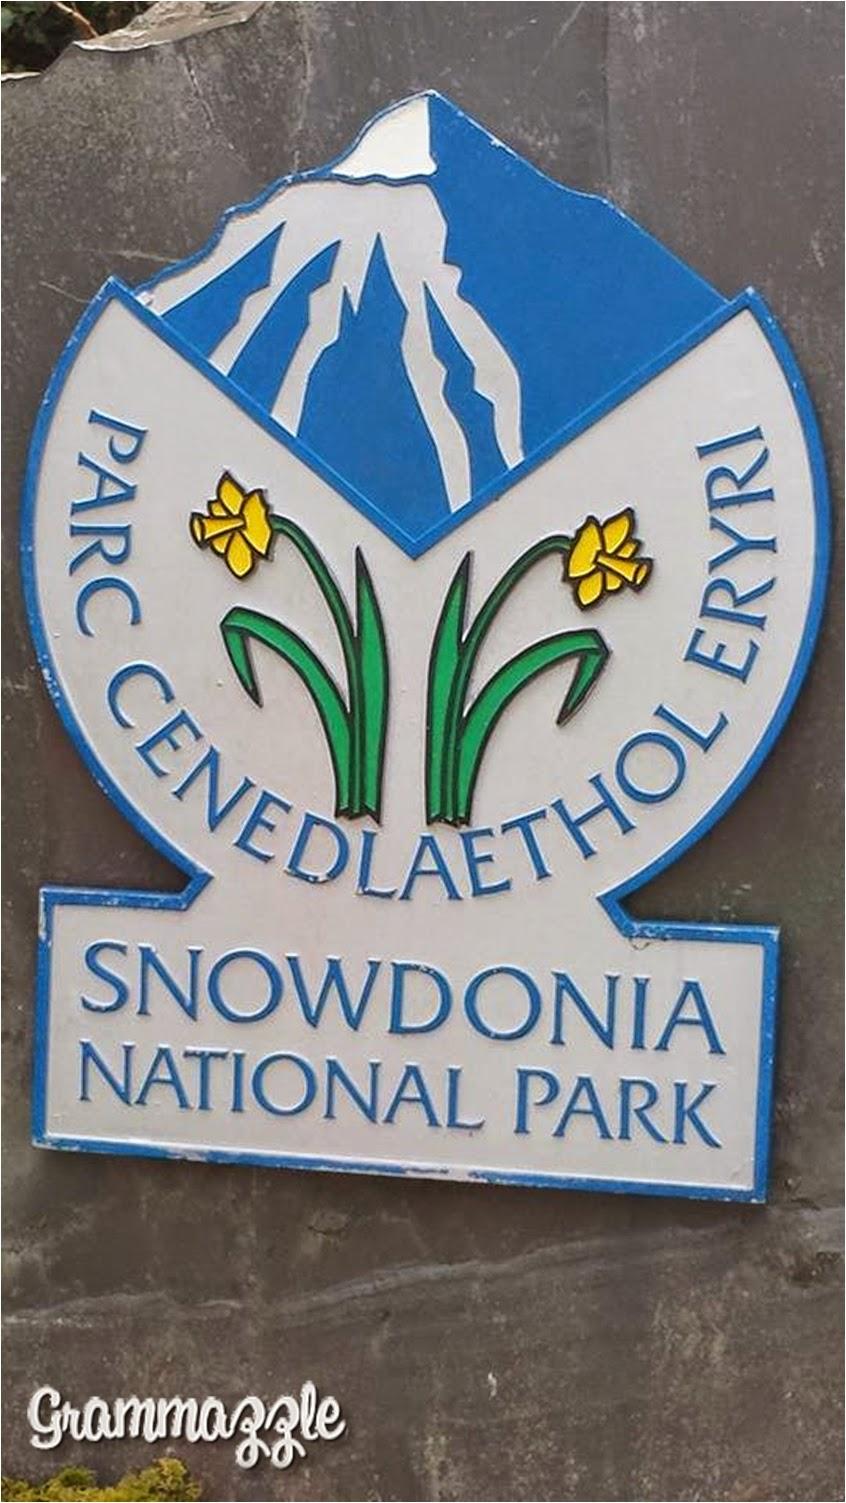 Grammazzle Snowdononia National Park Parque Nacional